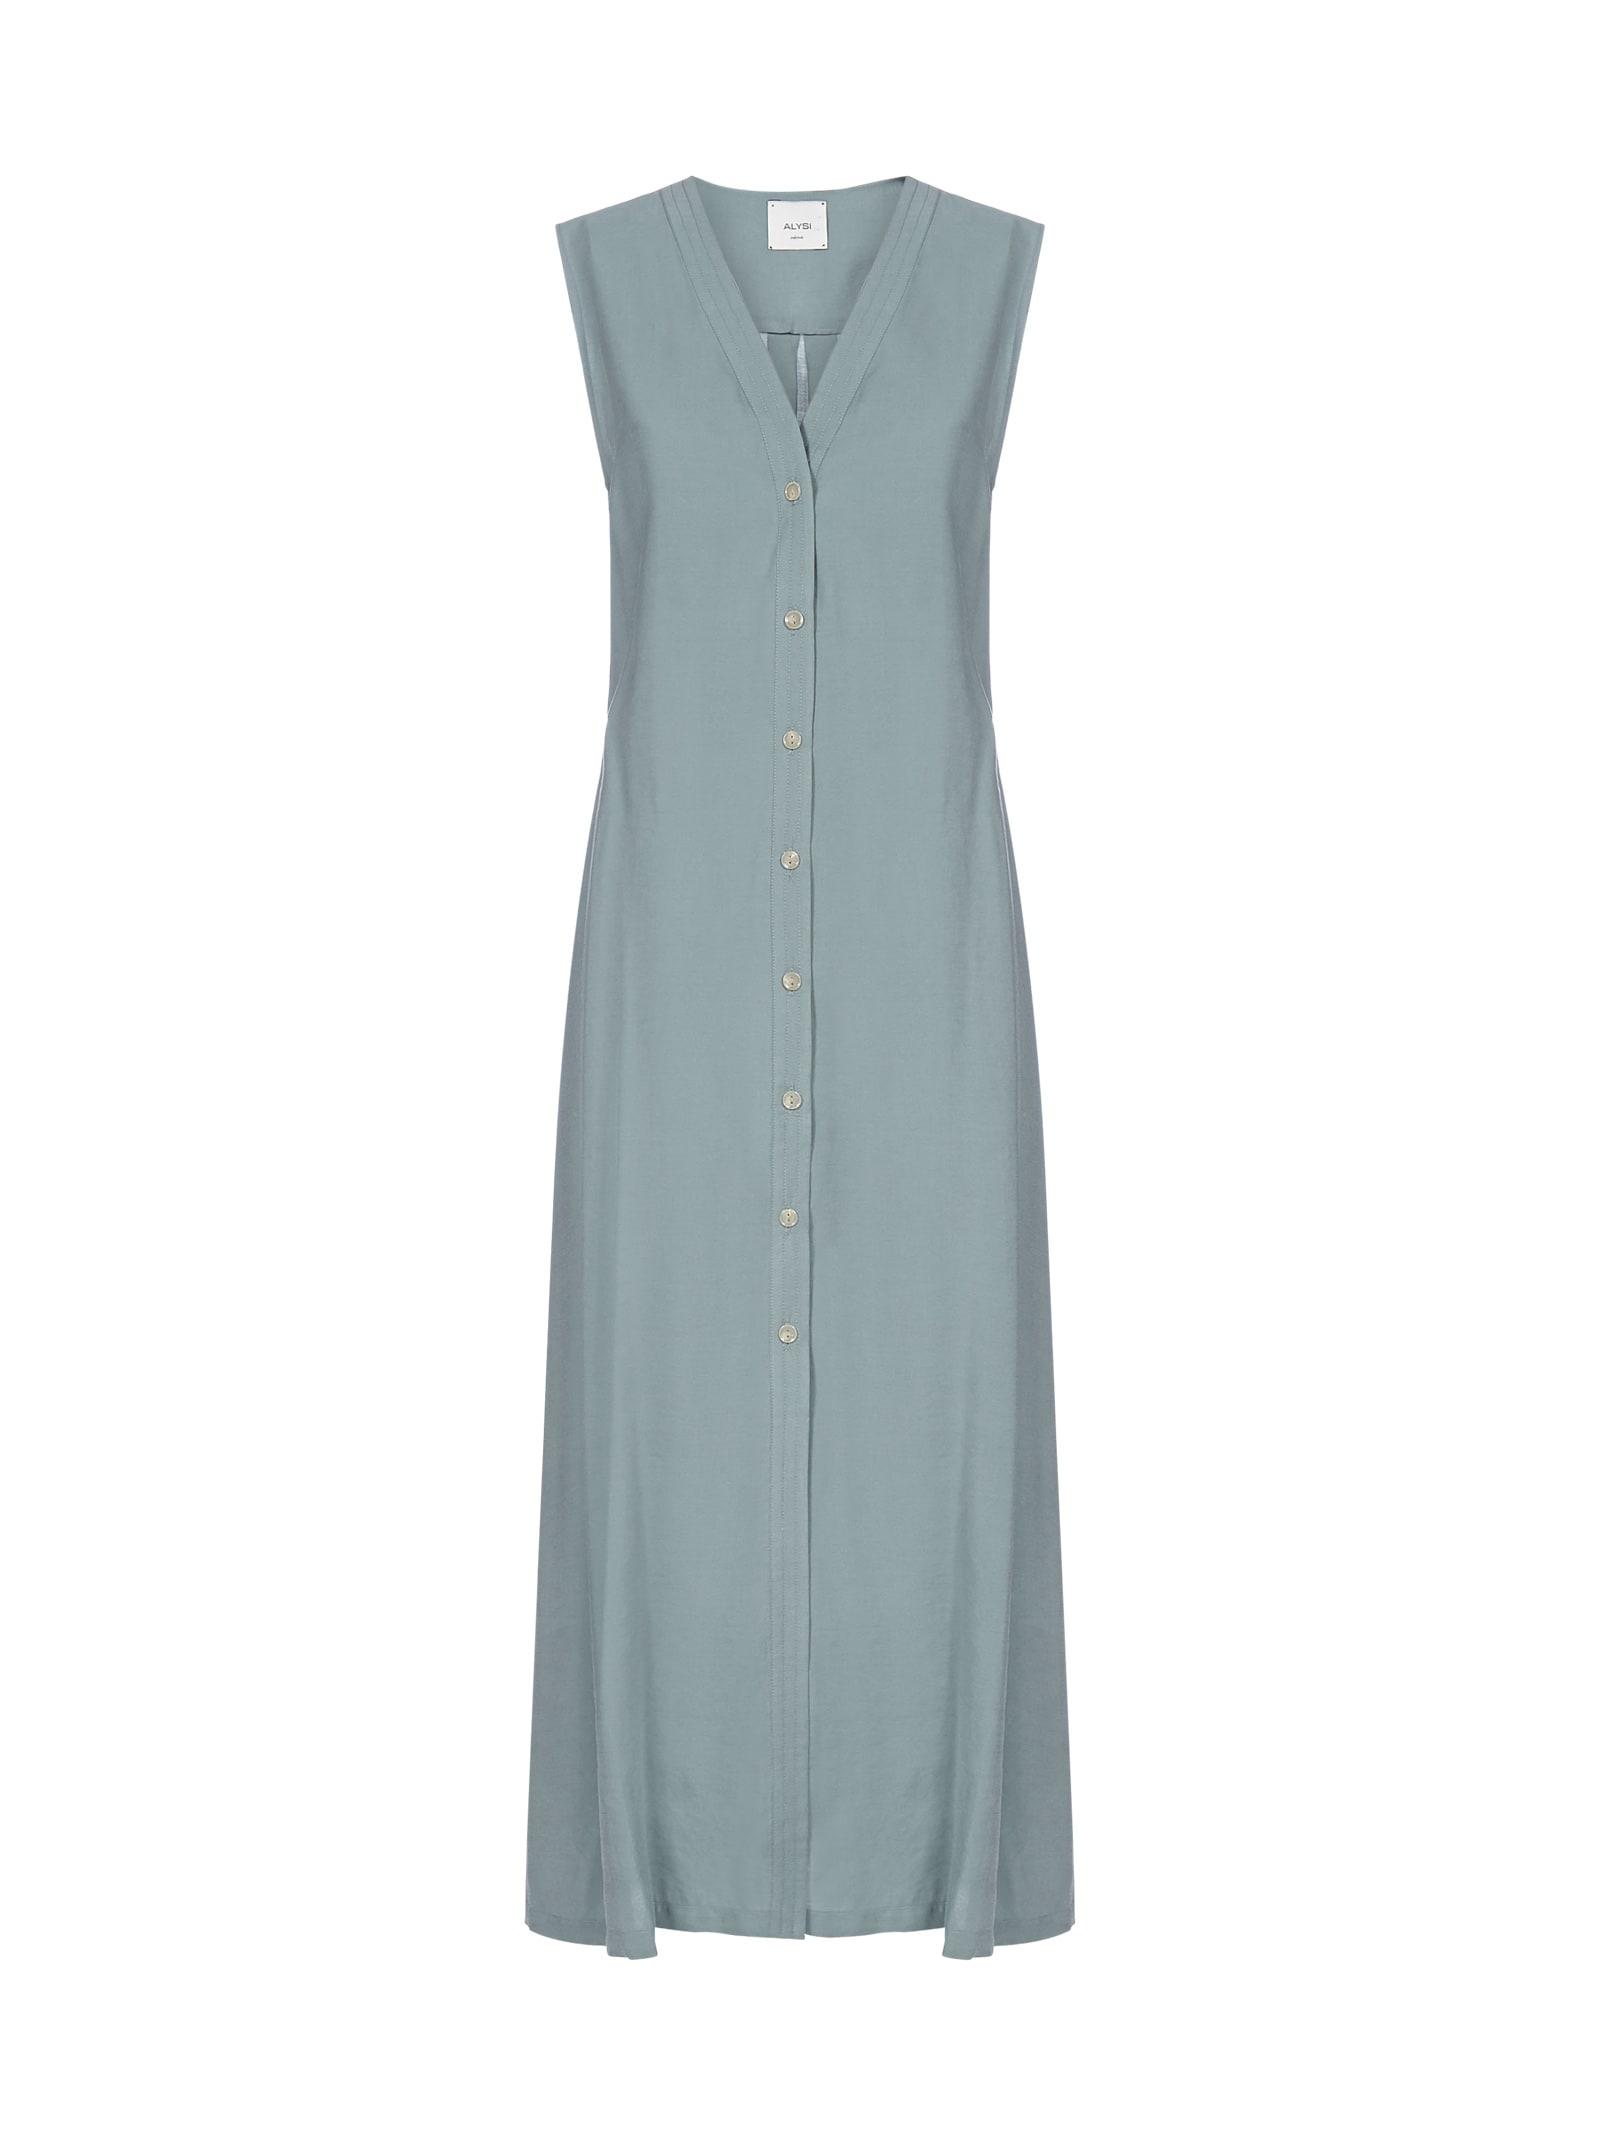 Alysi Clothing DRESS